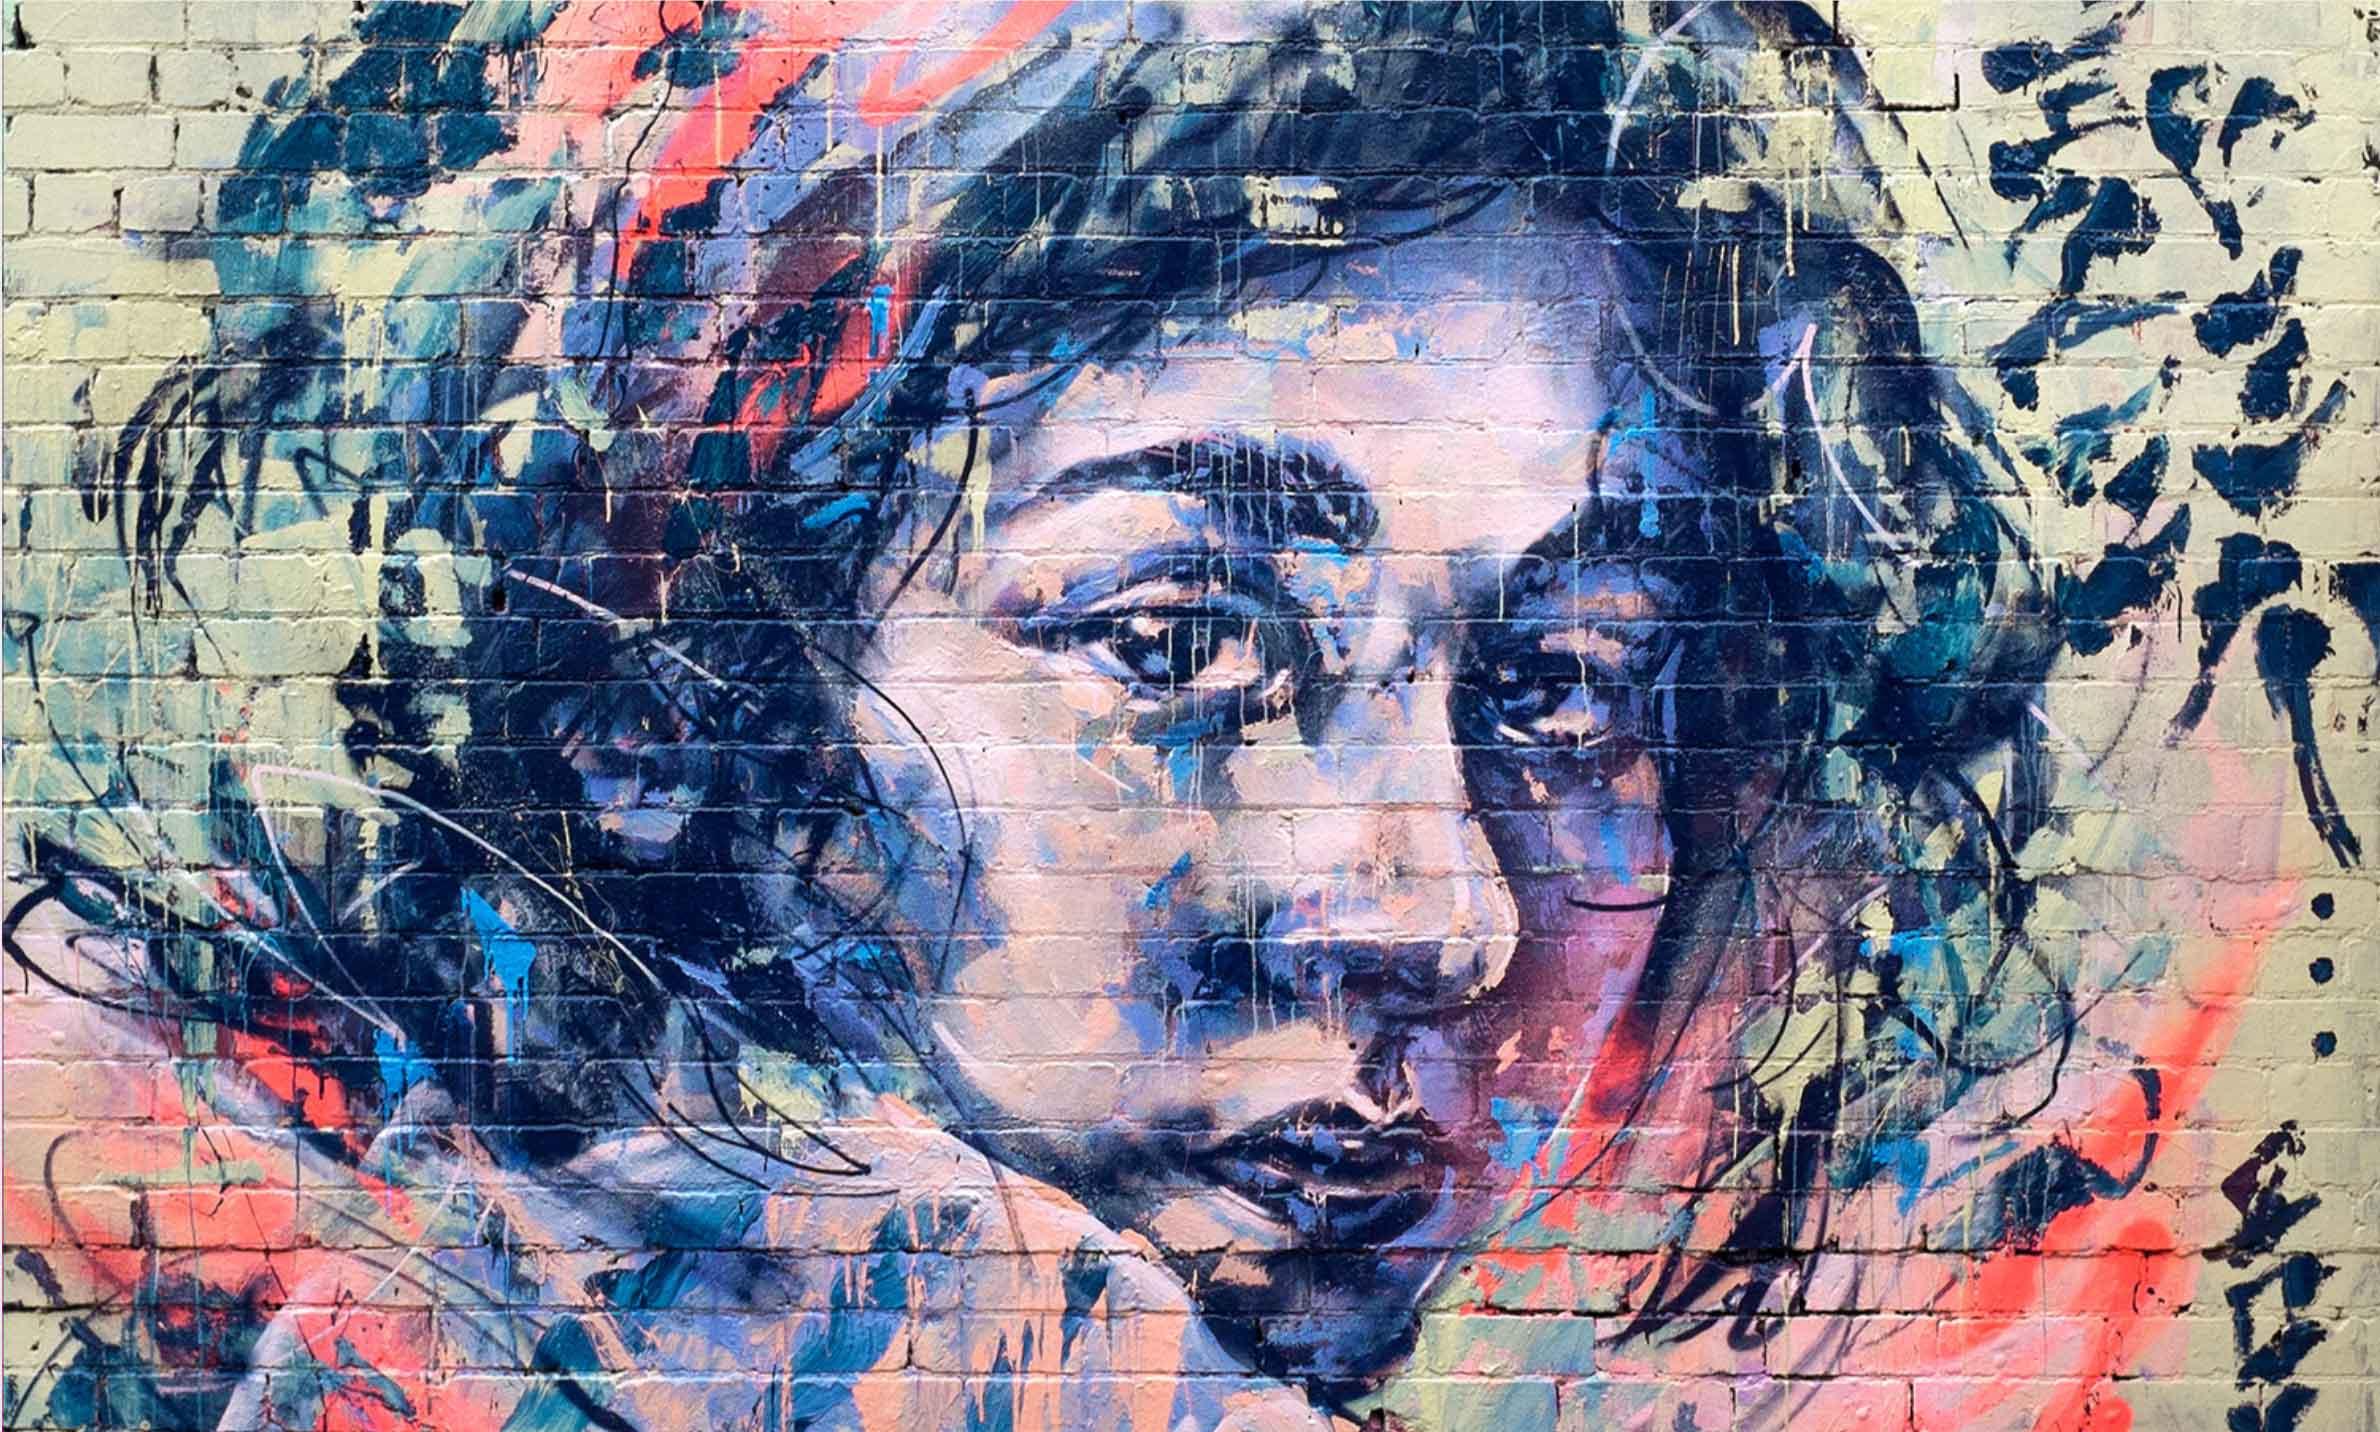 Mike-Eleven-Street-Artist-Bendigo-Pennyweight-Walk.jpg